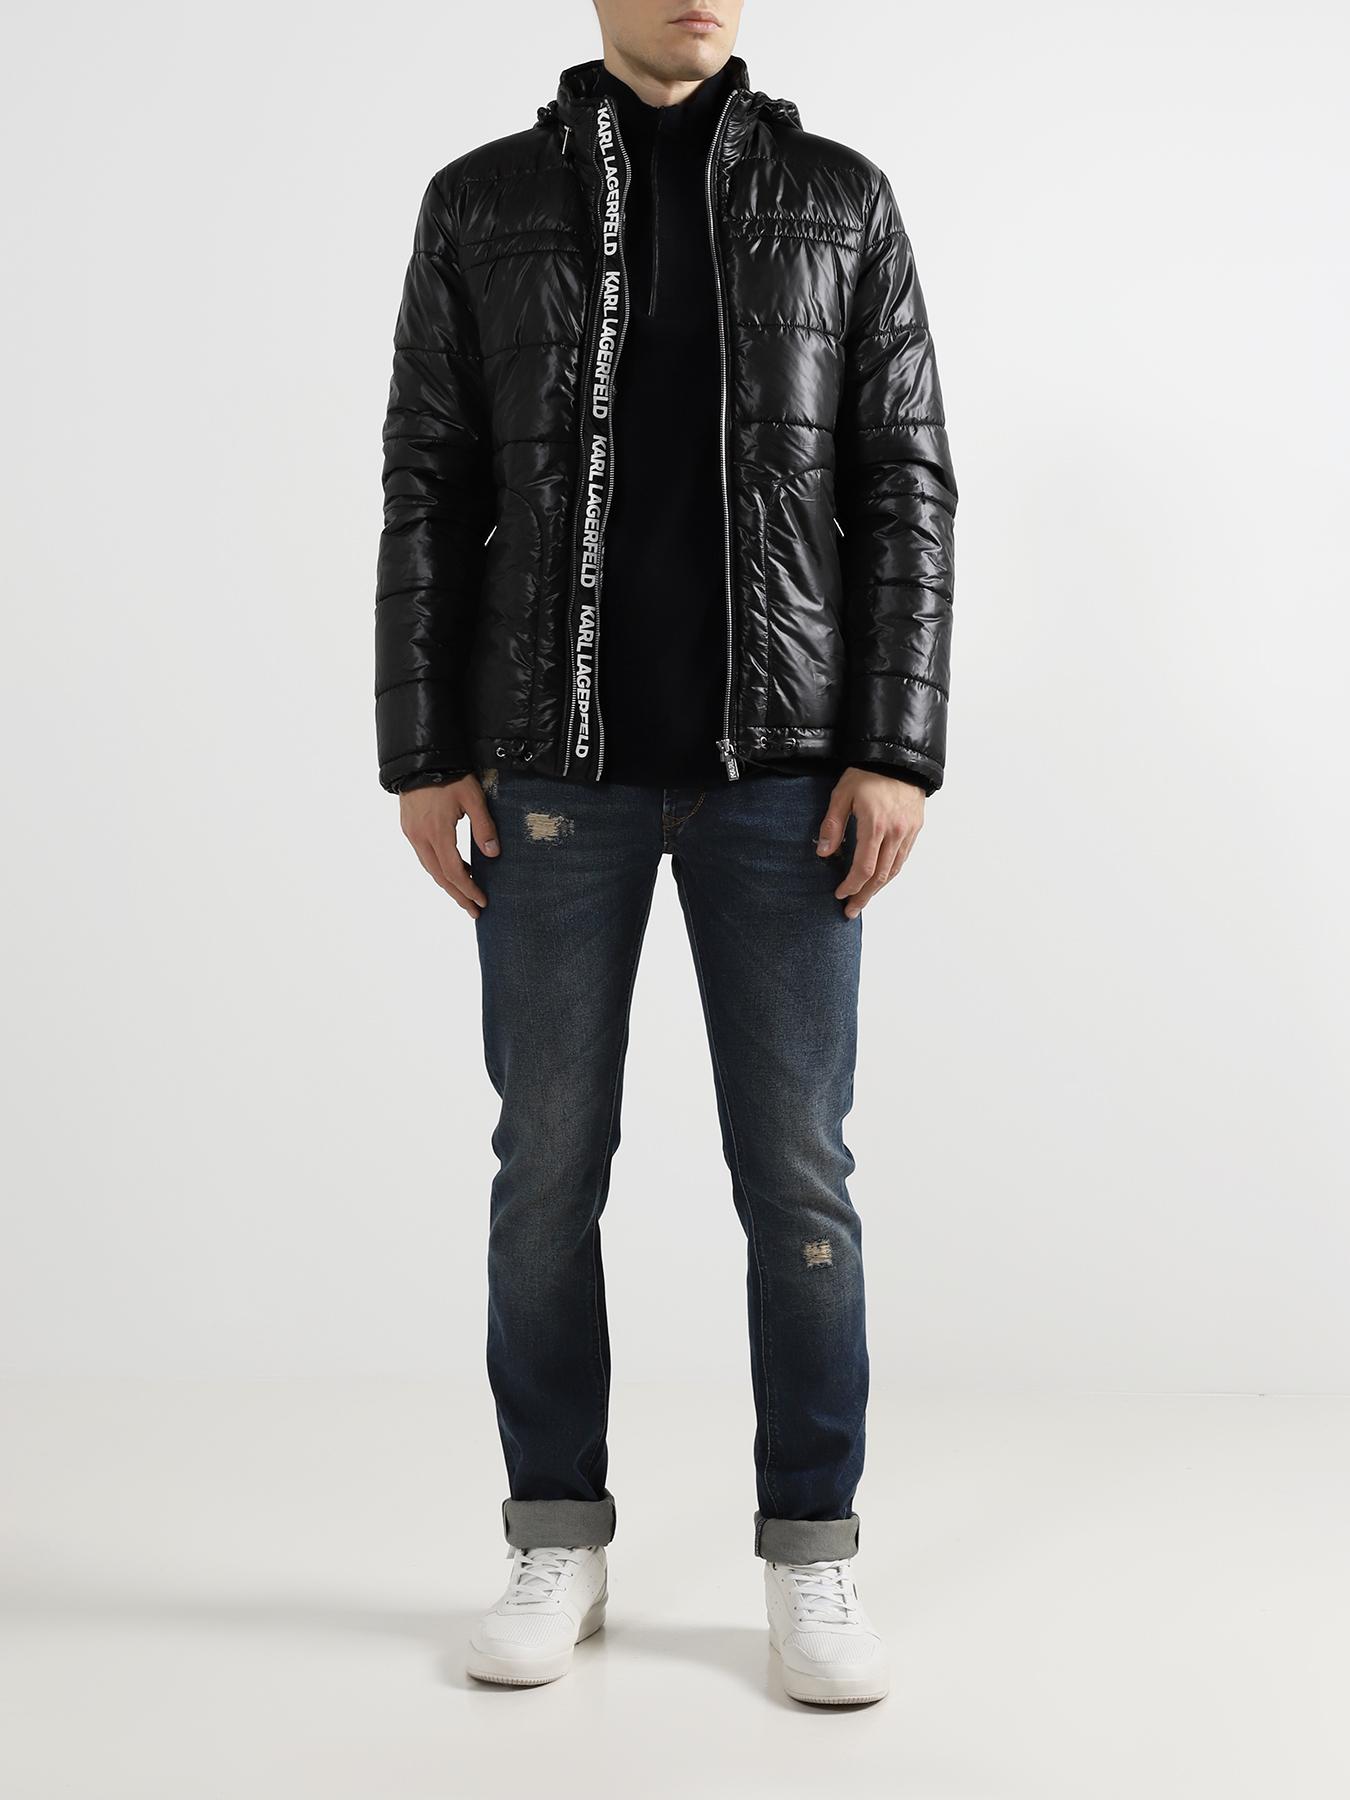 Куртка Karl Lagerfeld Мужская куртка karl lagerfeld vintage браслет из жемчуга